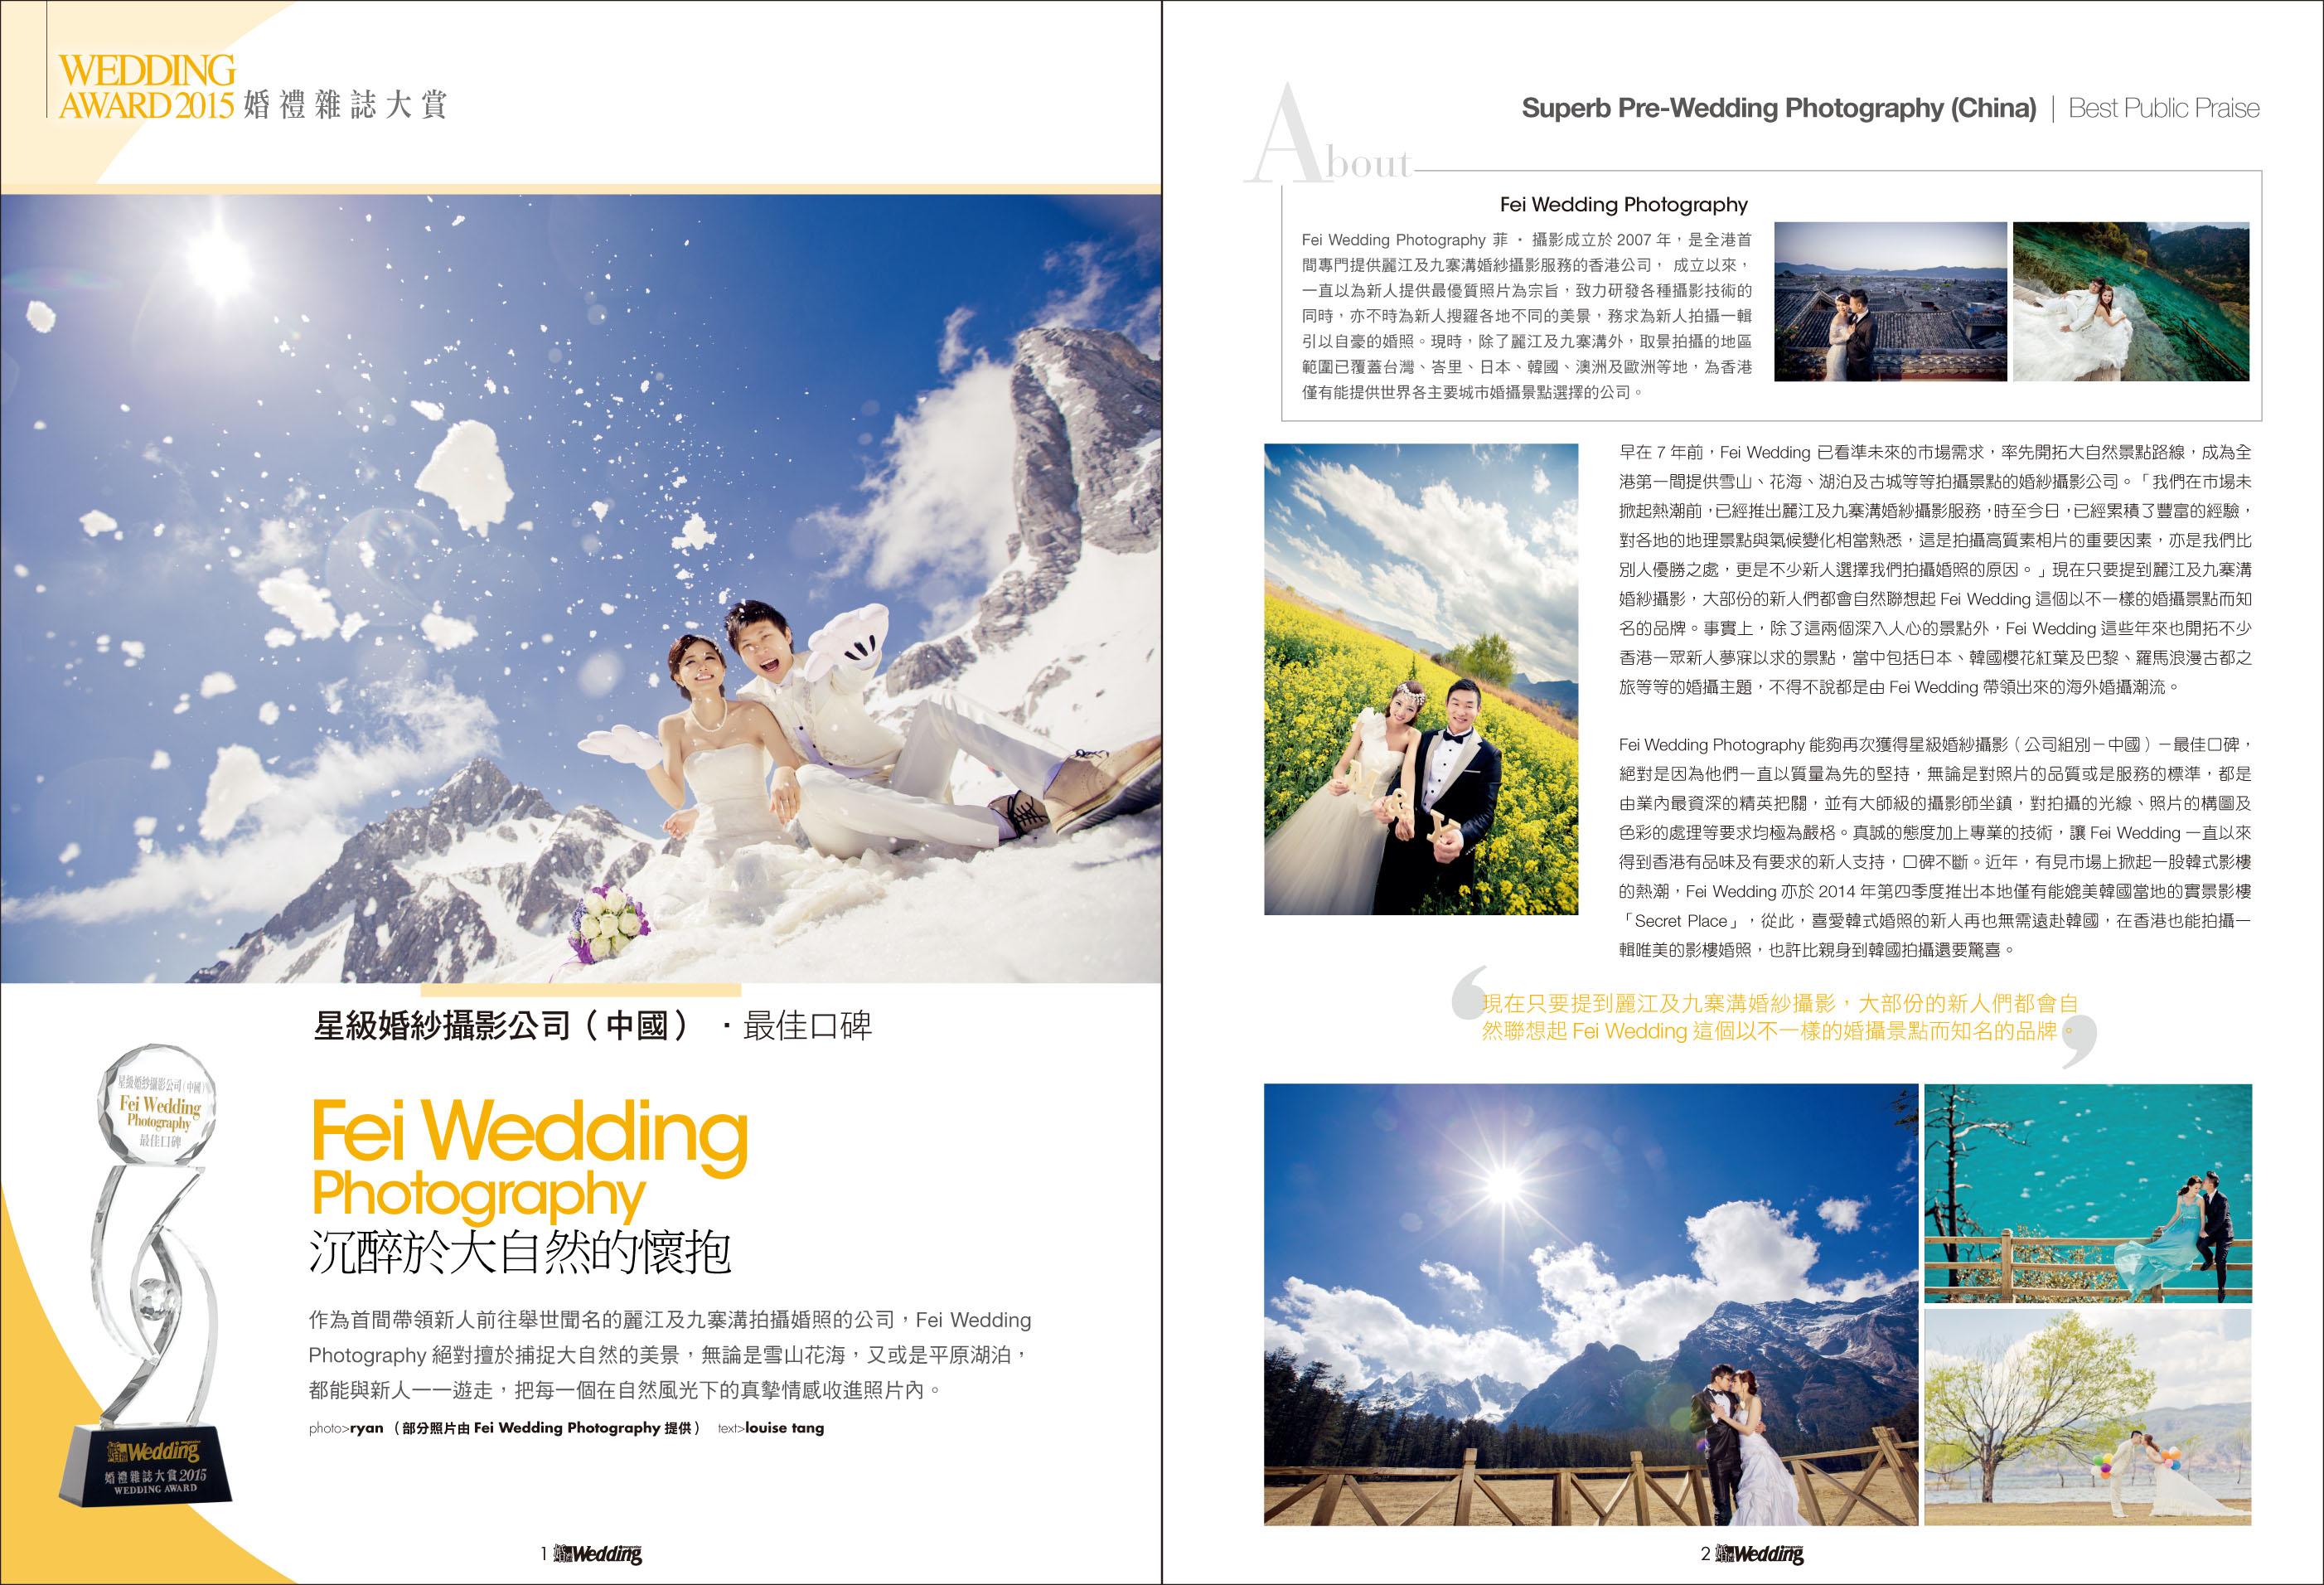 Fei Wedding 沉醉於大自然的懷抱 -  星級婚紗攝影 (中國) 最佳口碑 (婚禮雜誌 No. 173)